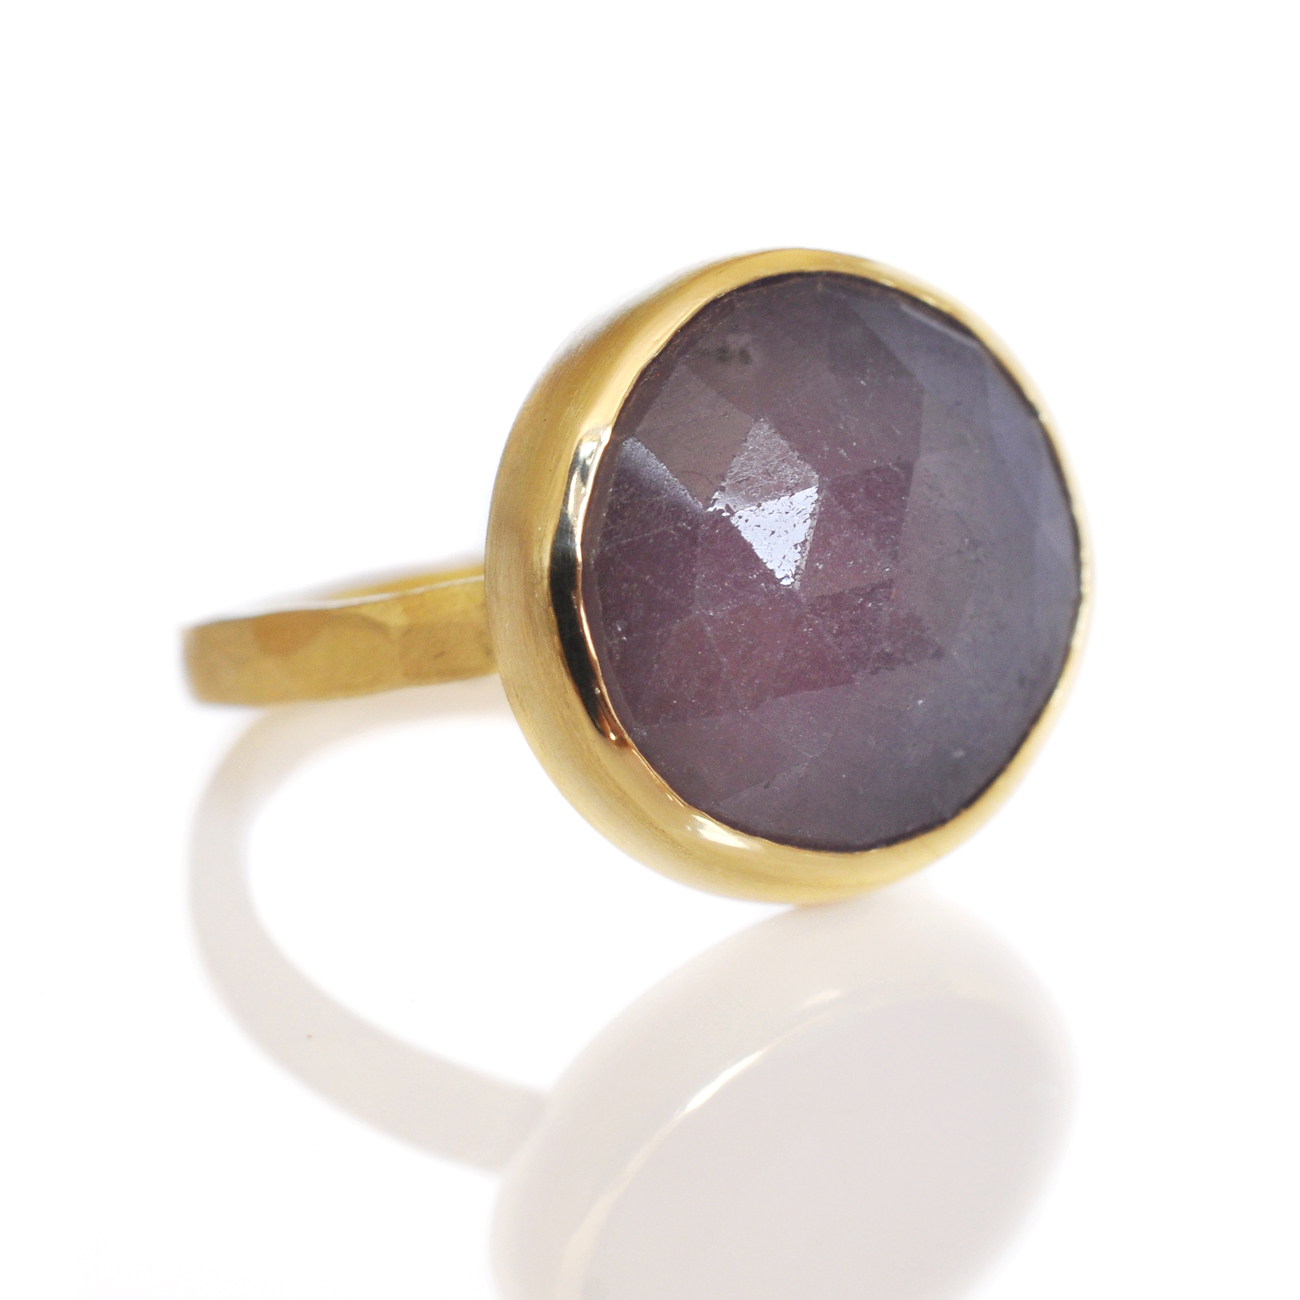 liz3-custom-rosecut-sapphire-cocktail-ring-gray-pink-heart-18ky-bezel-hammered-band.jpg